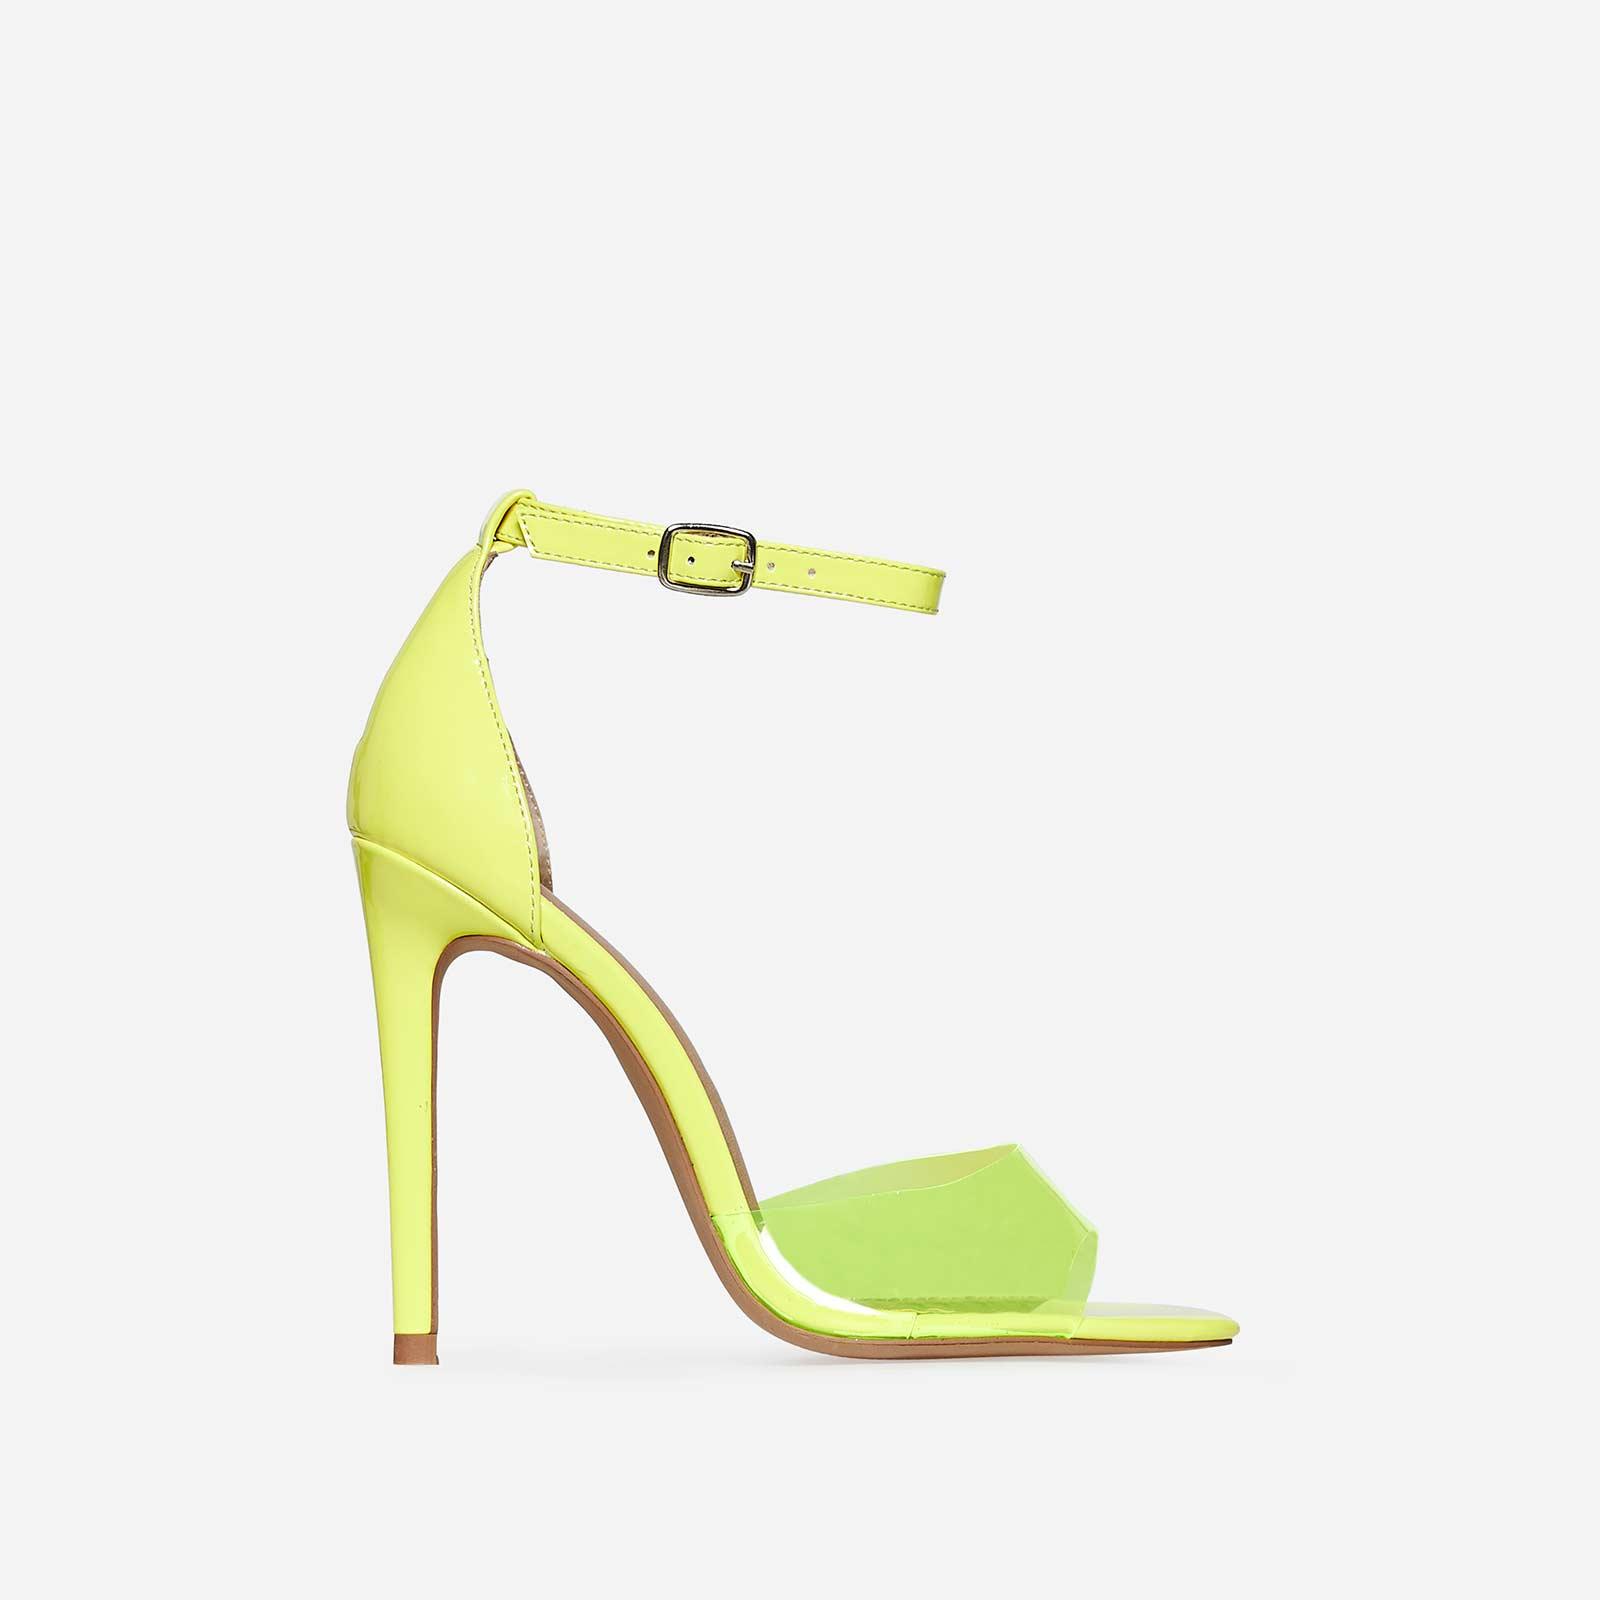 EGOKAIA - High heeled sandals - yellow 8Wa5zC4